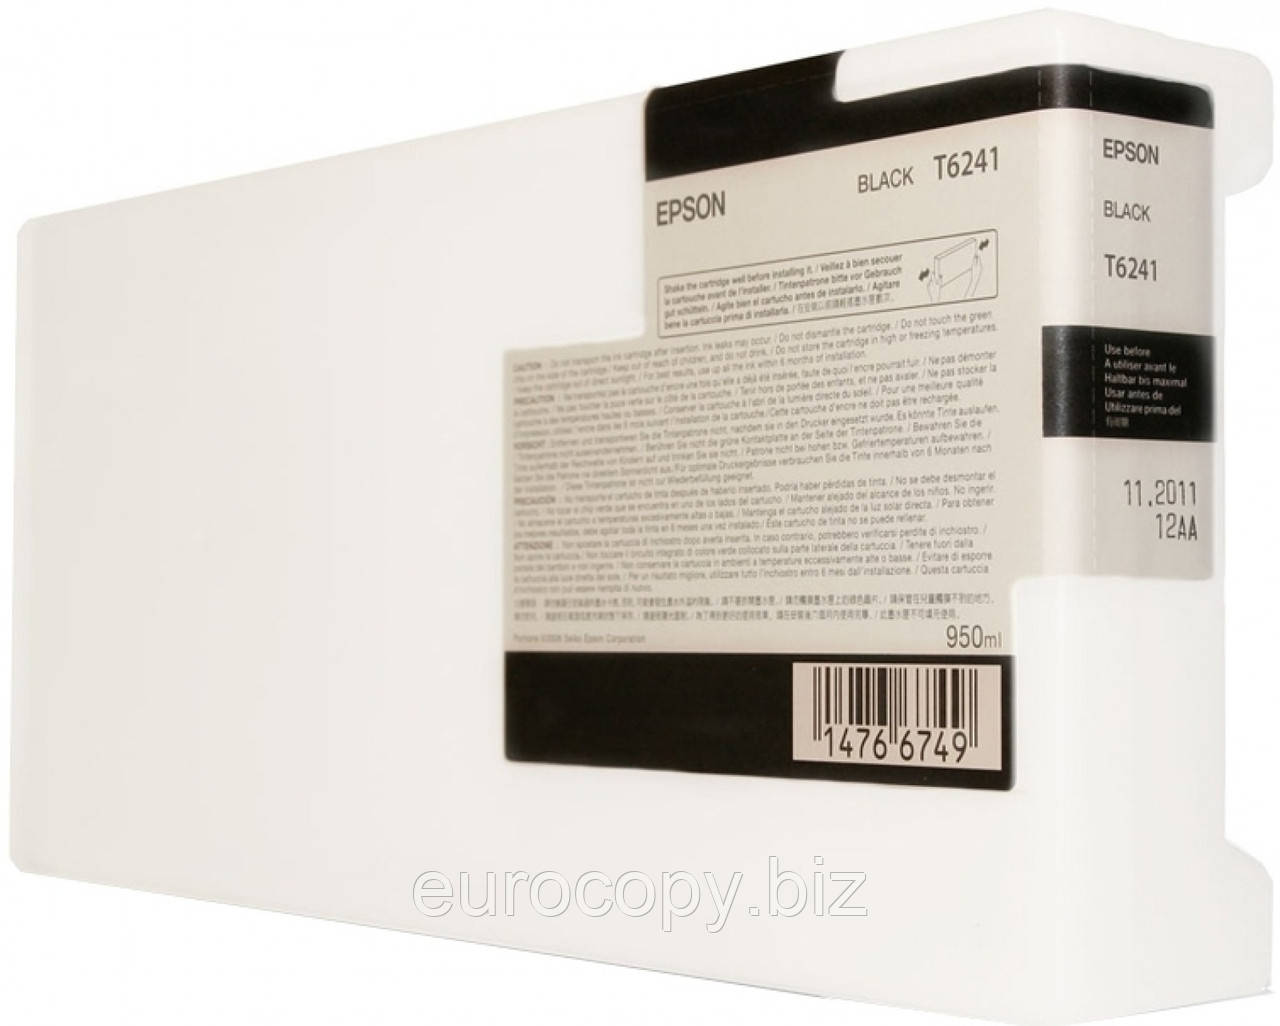 Картридж Epson SP-GS6000 Photo Black (C13T624100) Original